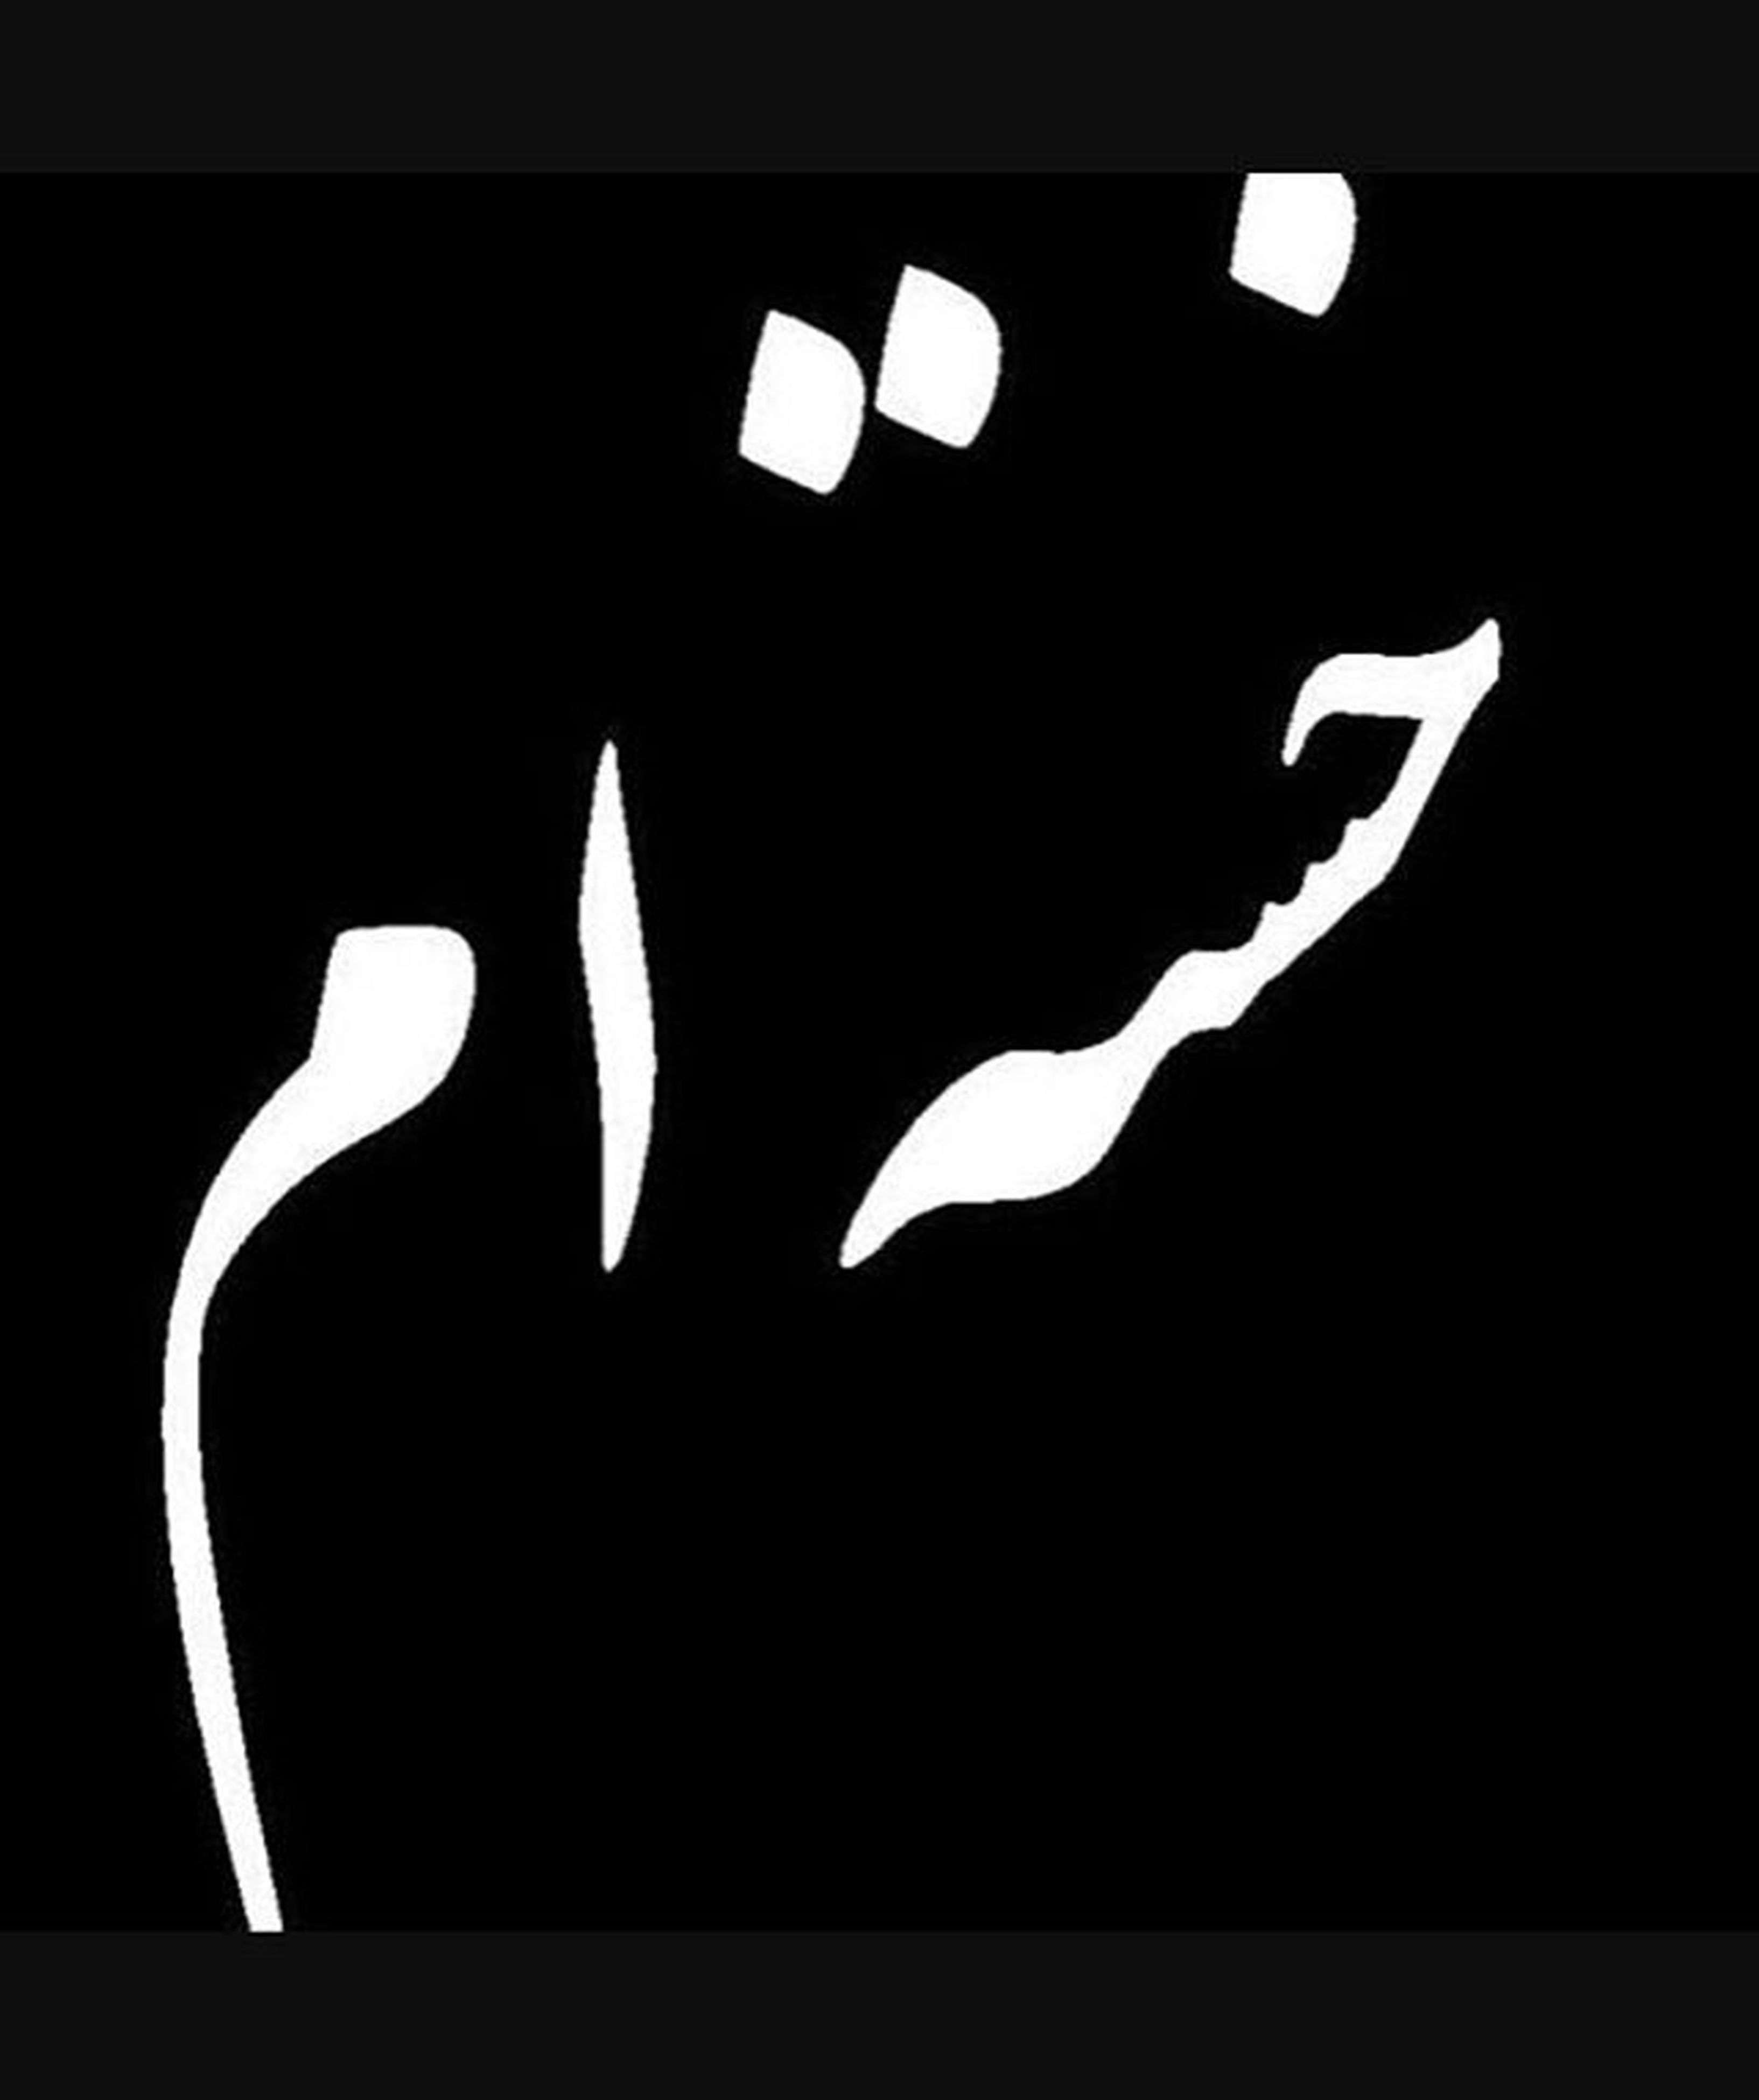 indoors, illuminated, night, human representation, dark, close-up, black background, art, creativity, studio shot, text, art and craft, copy space, western script, no people, auto post production filter, communication, animal representation, silhouette, light - natural phenomenon